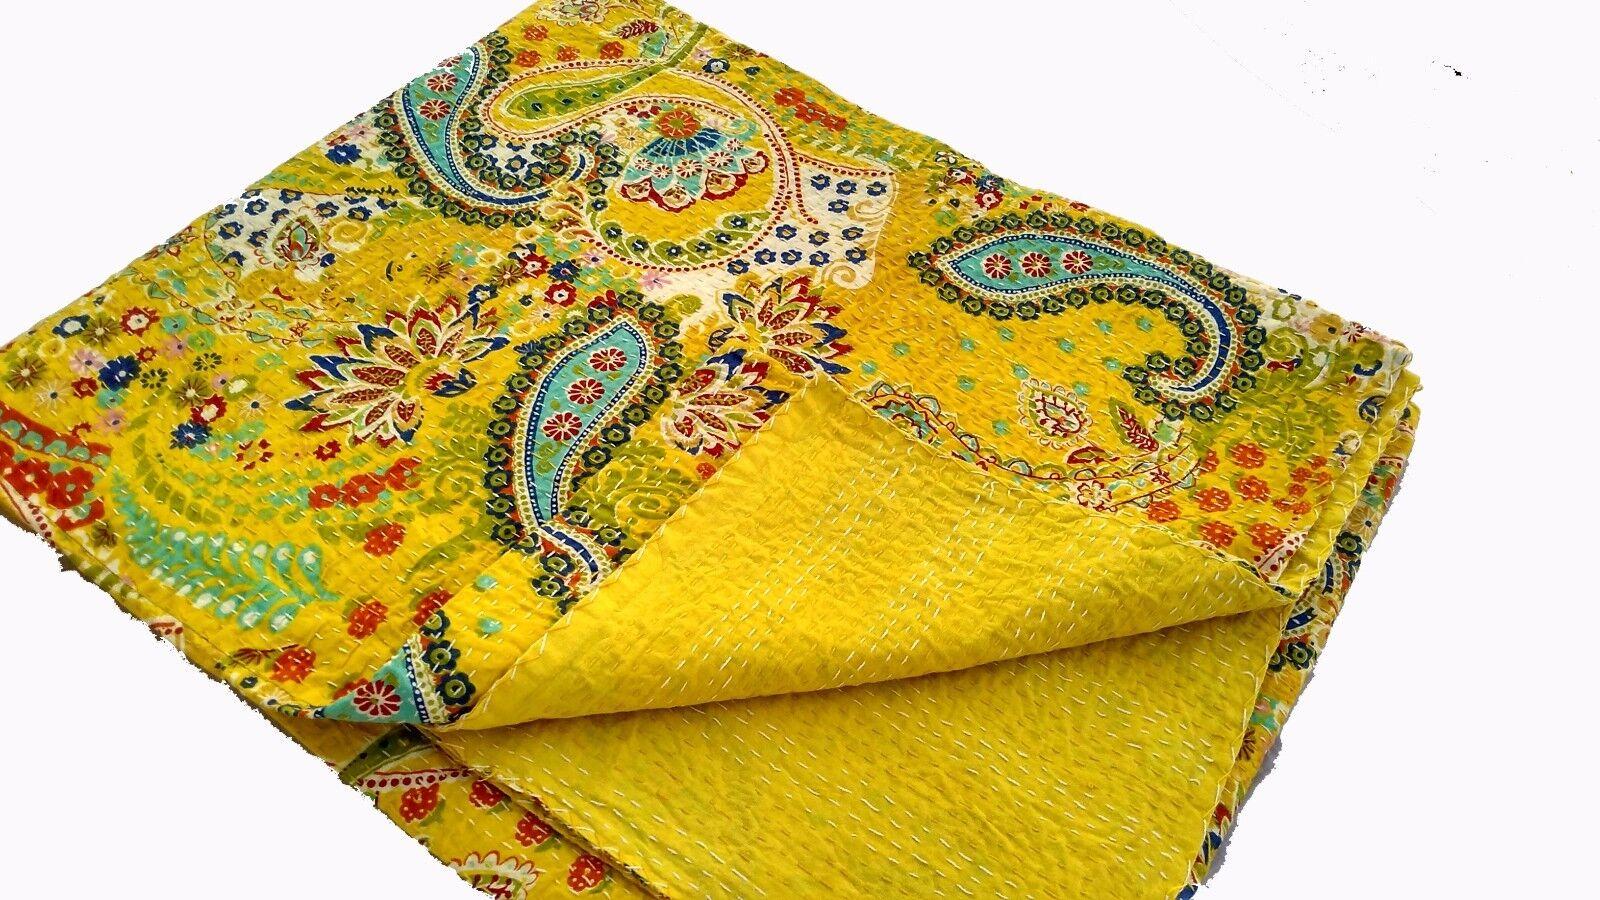 Cotton Bedcover Bedspread Vintage Kantha Quilt Gudri Reversible Throw Ralli Beds